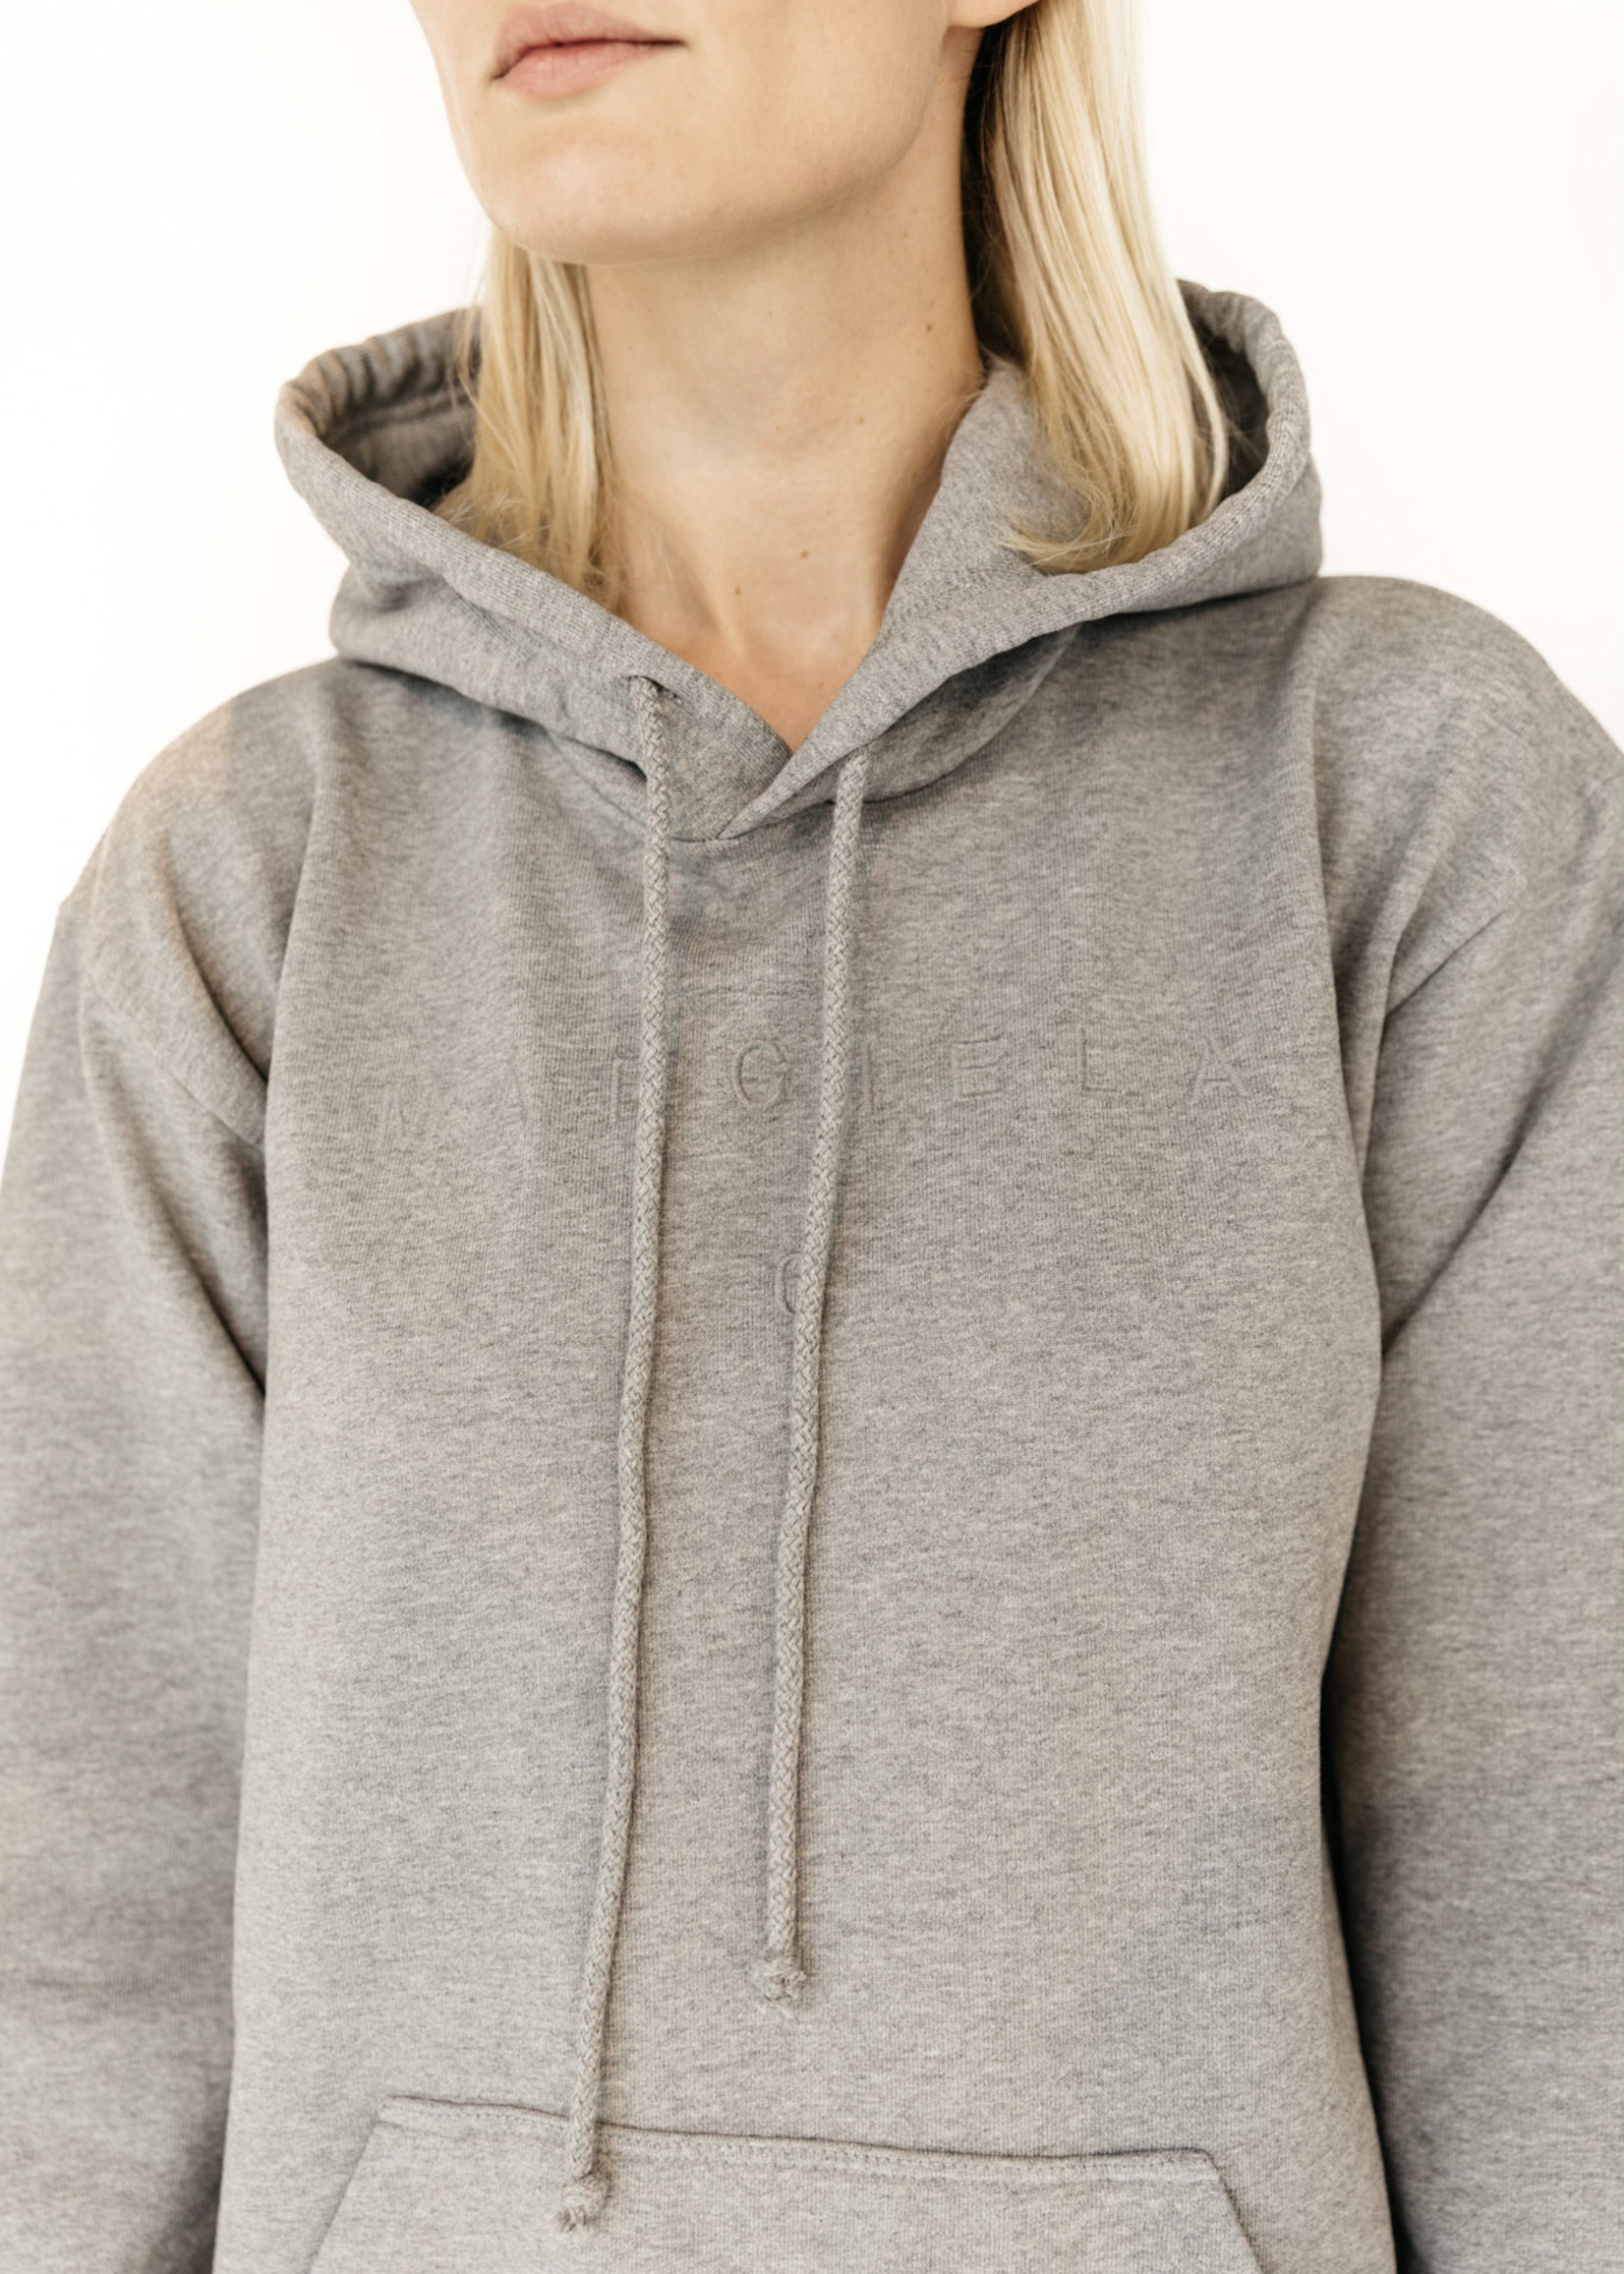 MM6 MAISON MARGIELA Embroidered Tonal Logo Hoodie in Heather Grey